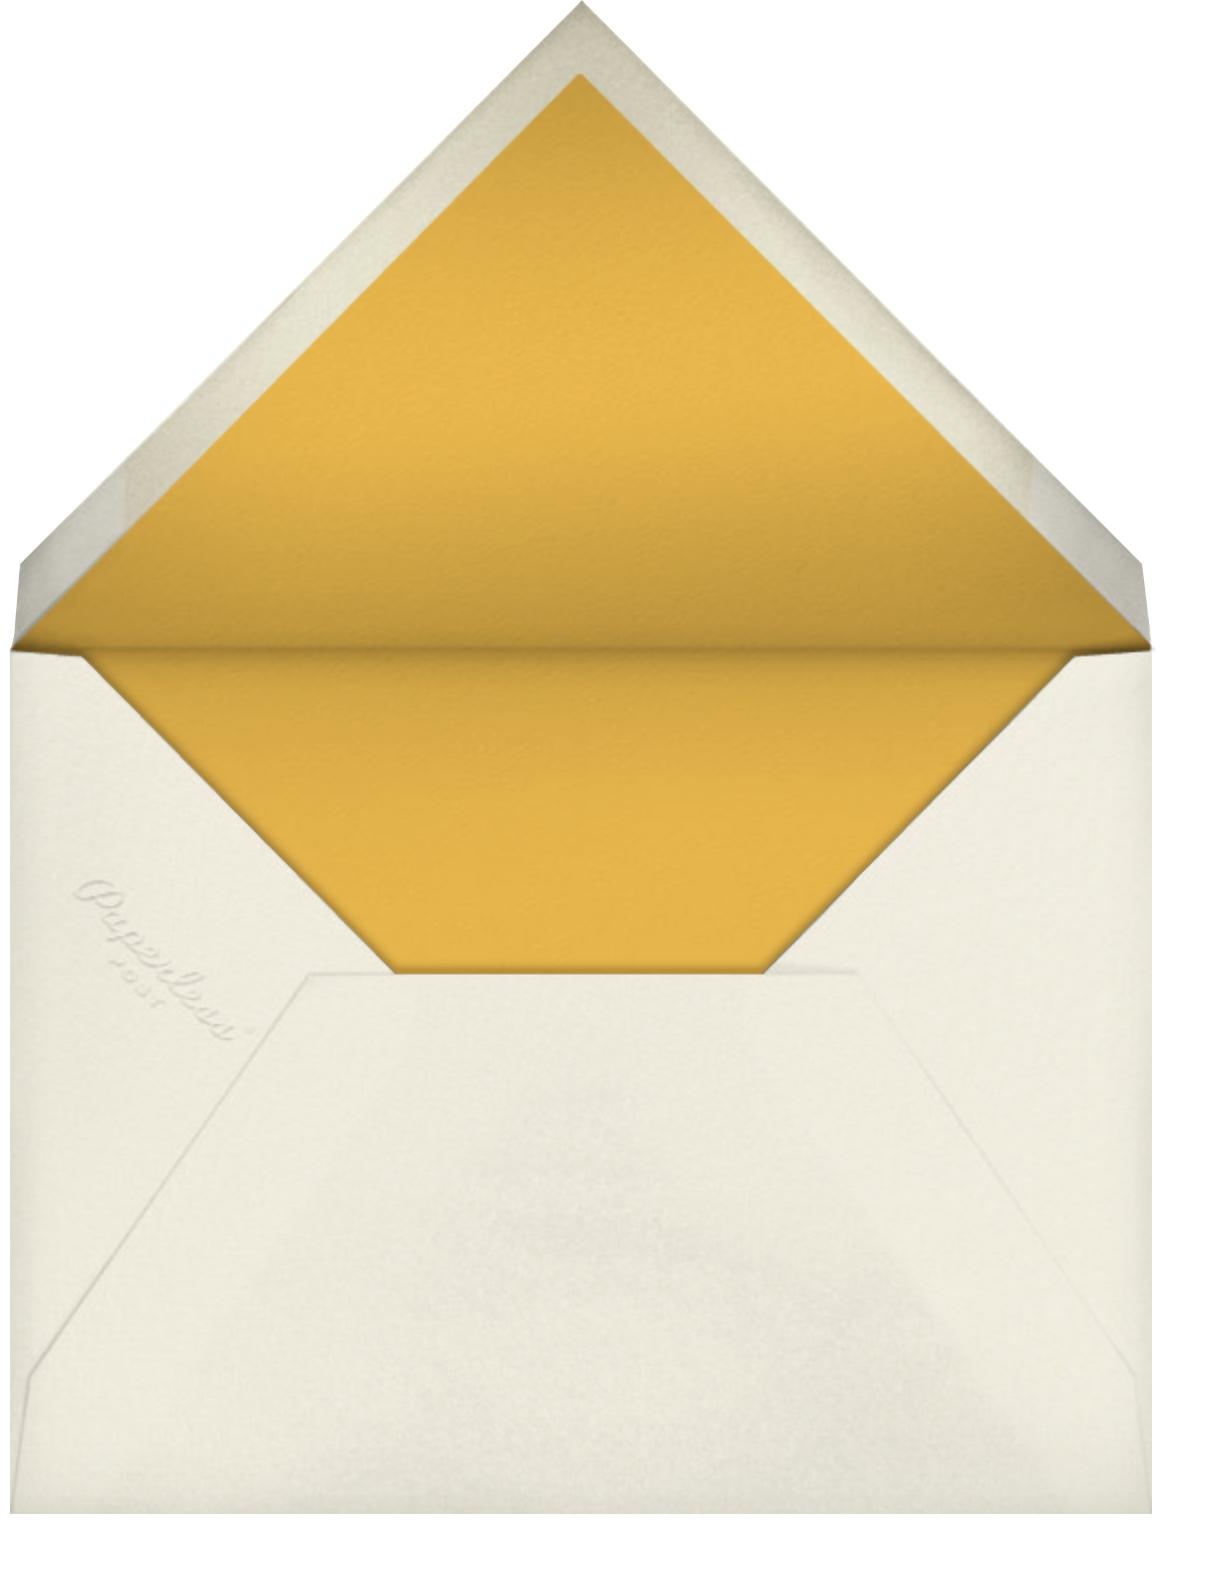 Birthday Girl (Blanca Gomez) - Fair - Red Cap Cards - Envelope